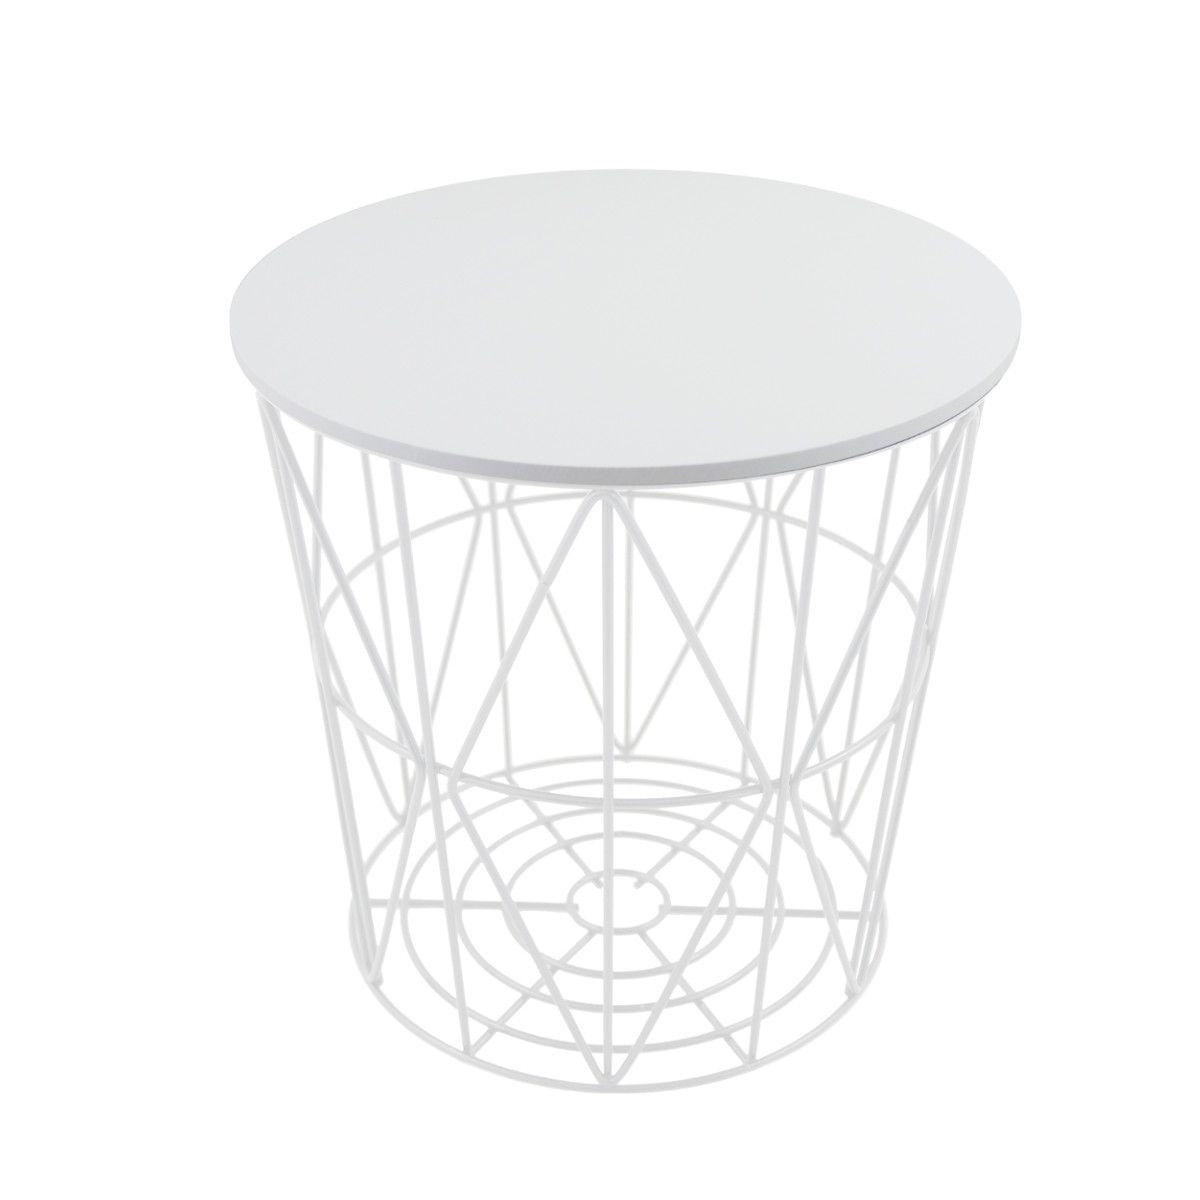 Primoliving Design Drahtkoerbe In 4 Groessen Drahtkorb Tisch Korb Mit Deckel Weiss Side Table Decor Home Decor